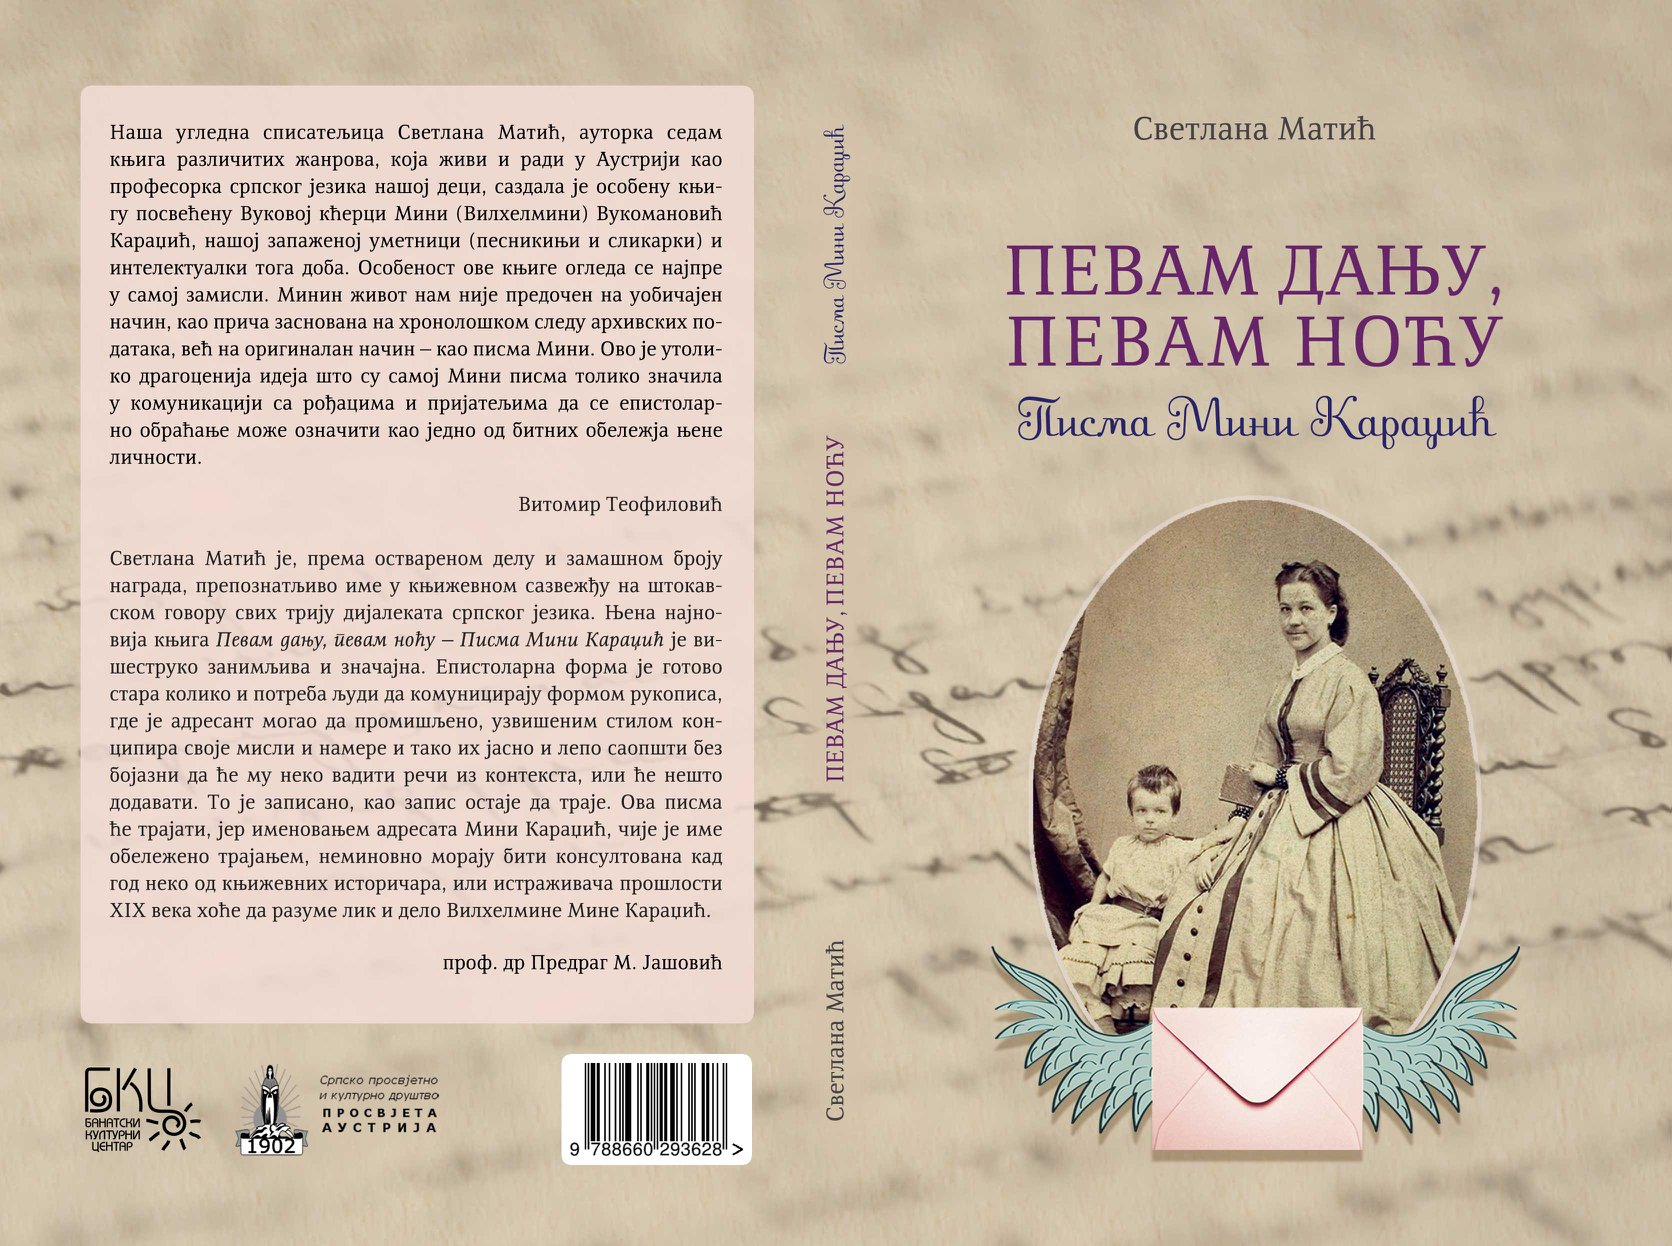 Beč: Promocijа knjige o Mini Kаrаdžić